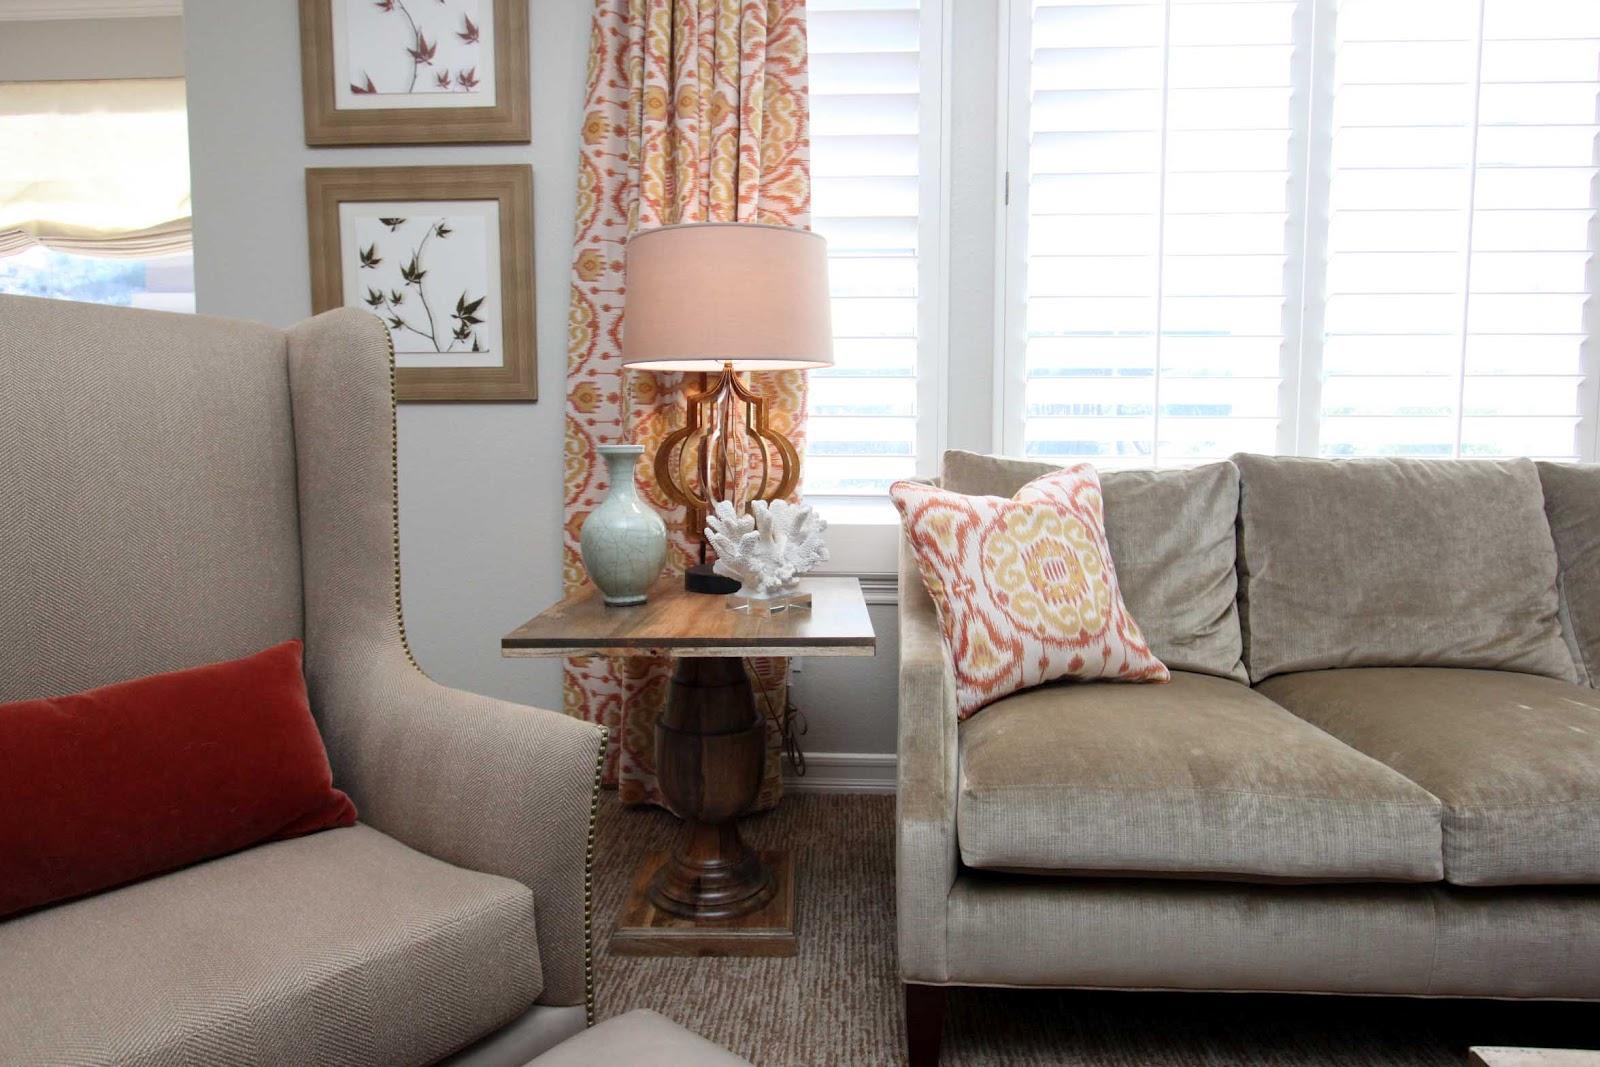 craigslist bedroom furniture orange county